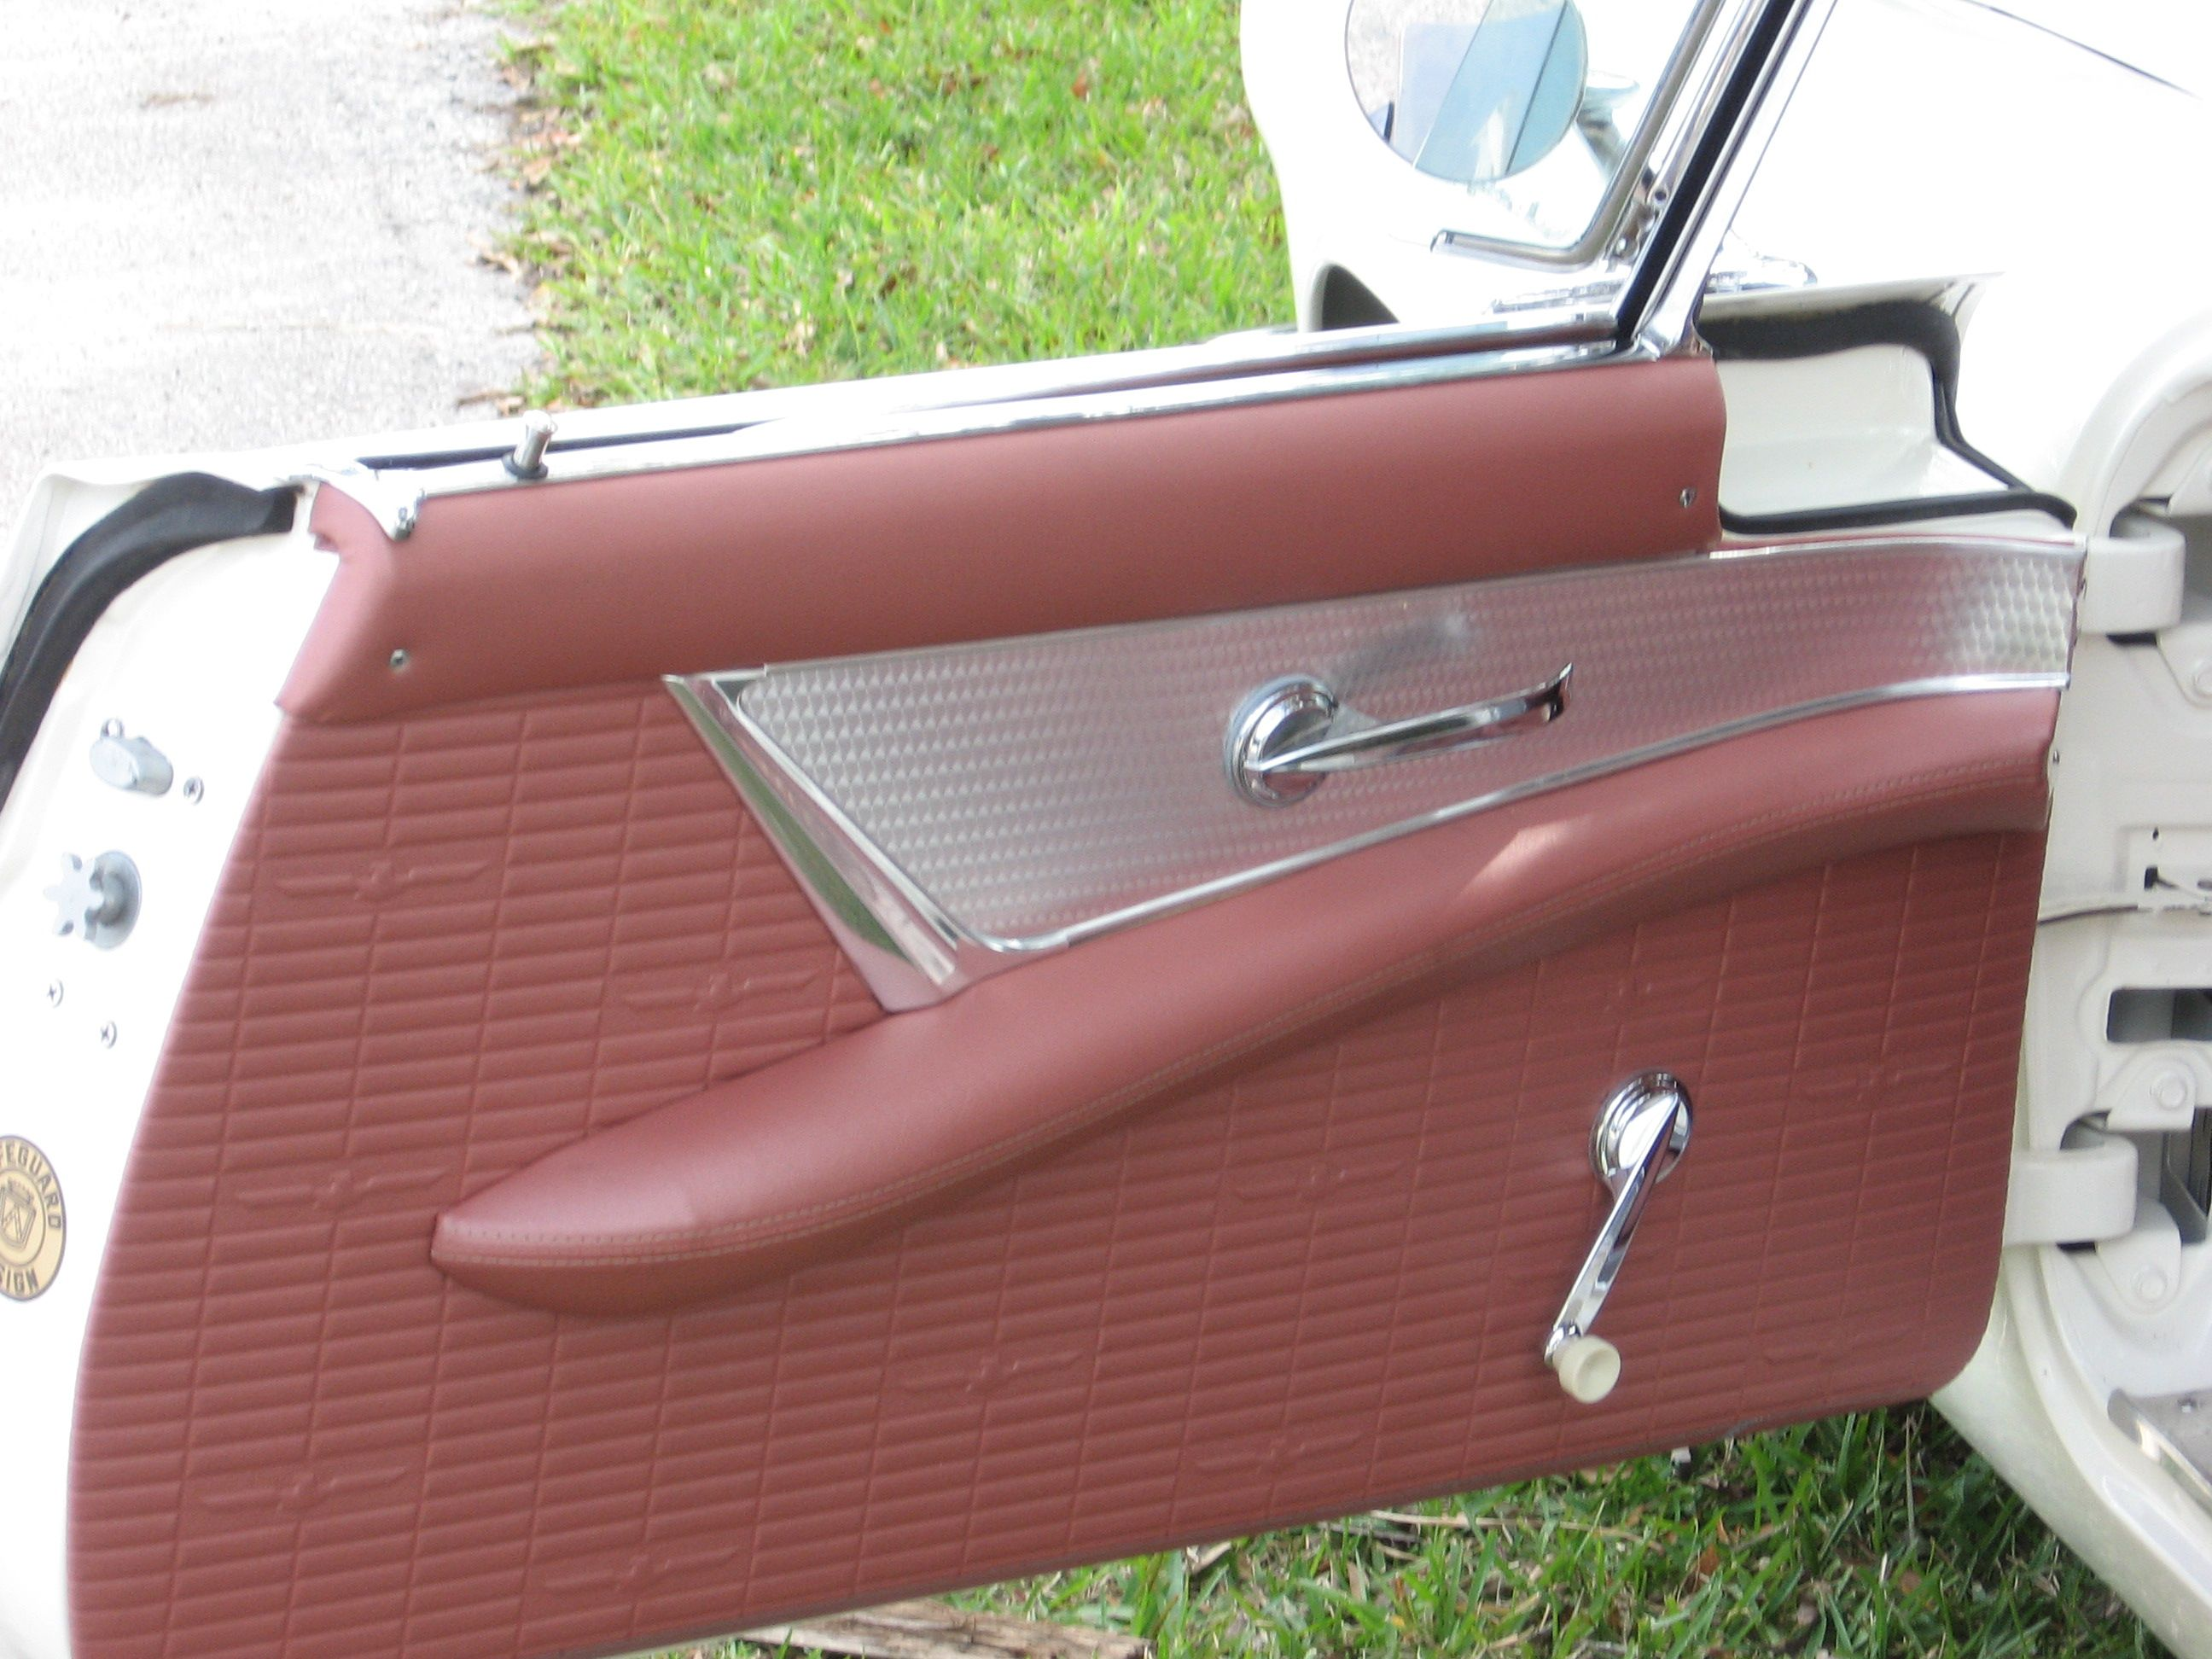 1957 Ford Thunderbird New Door Panels Ford Thunderbird Classic Cars Ford